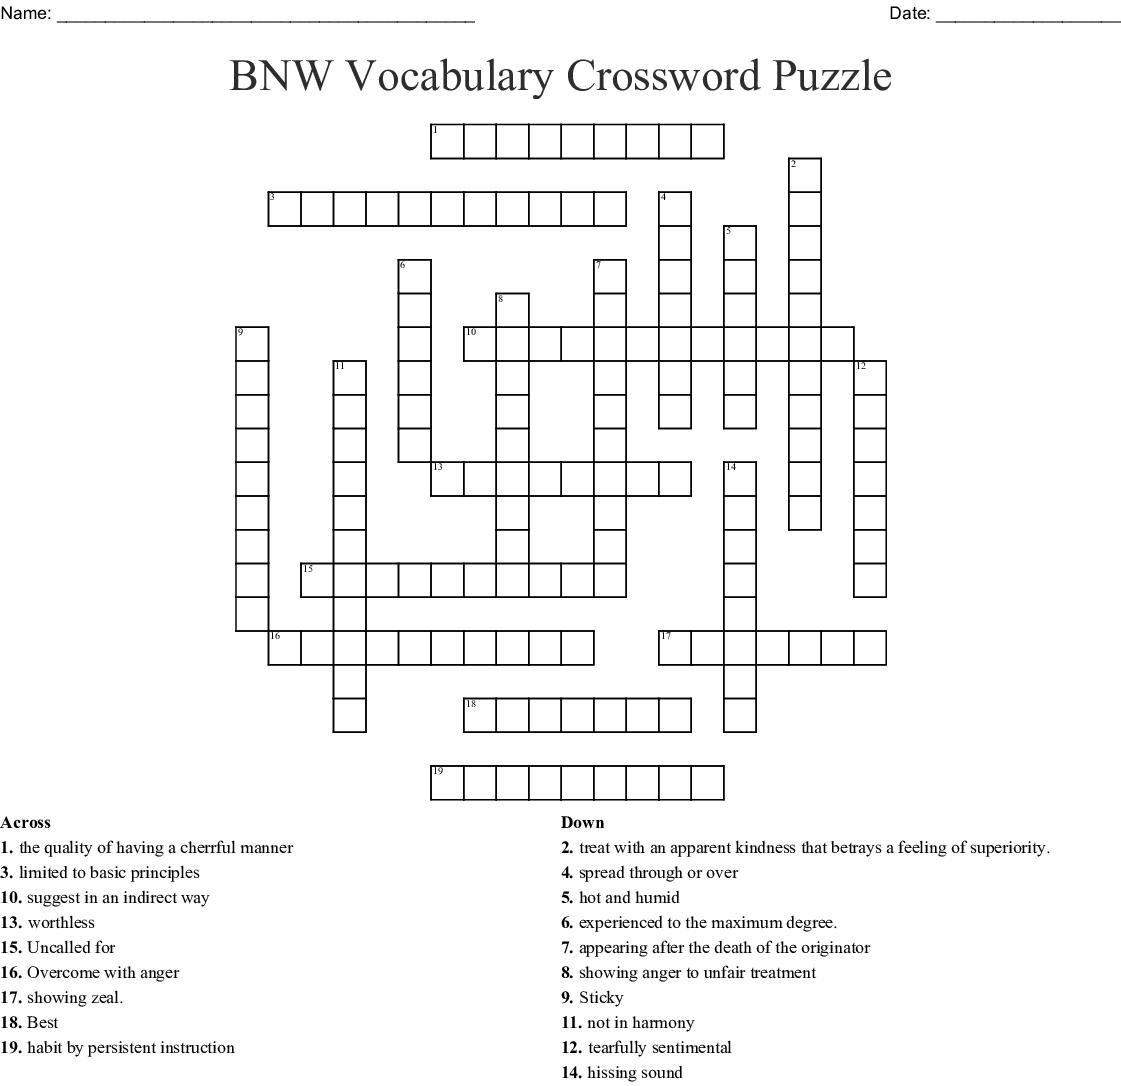 BNW Vocabulary Crossword Puzzle - WordMint